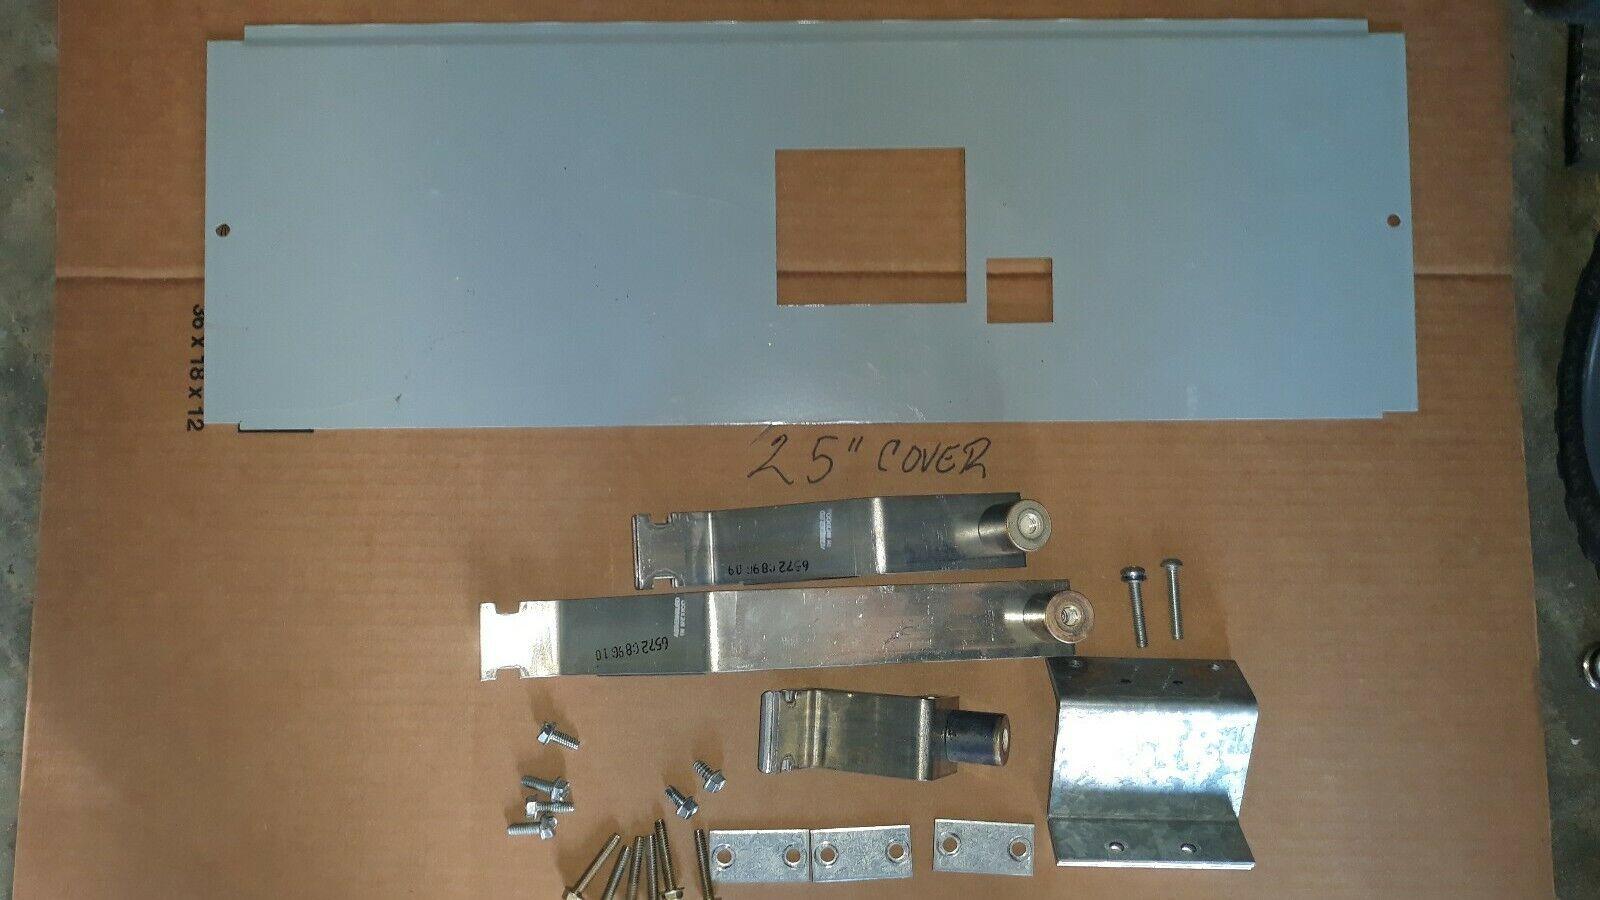 Westinghouse KPRL4FD Twin Breaker Mounting Hardware Kit Up To 150A Cutler Hammer